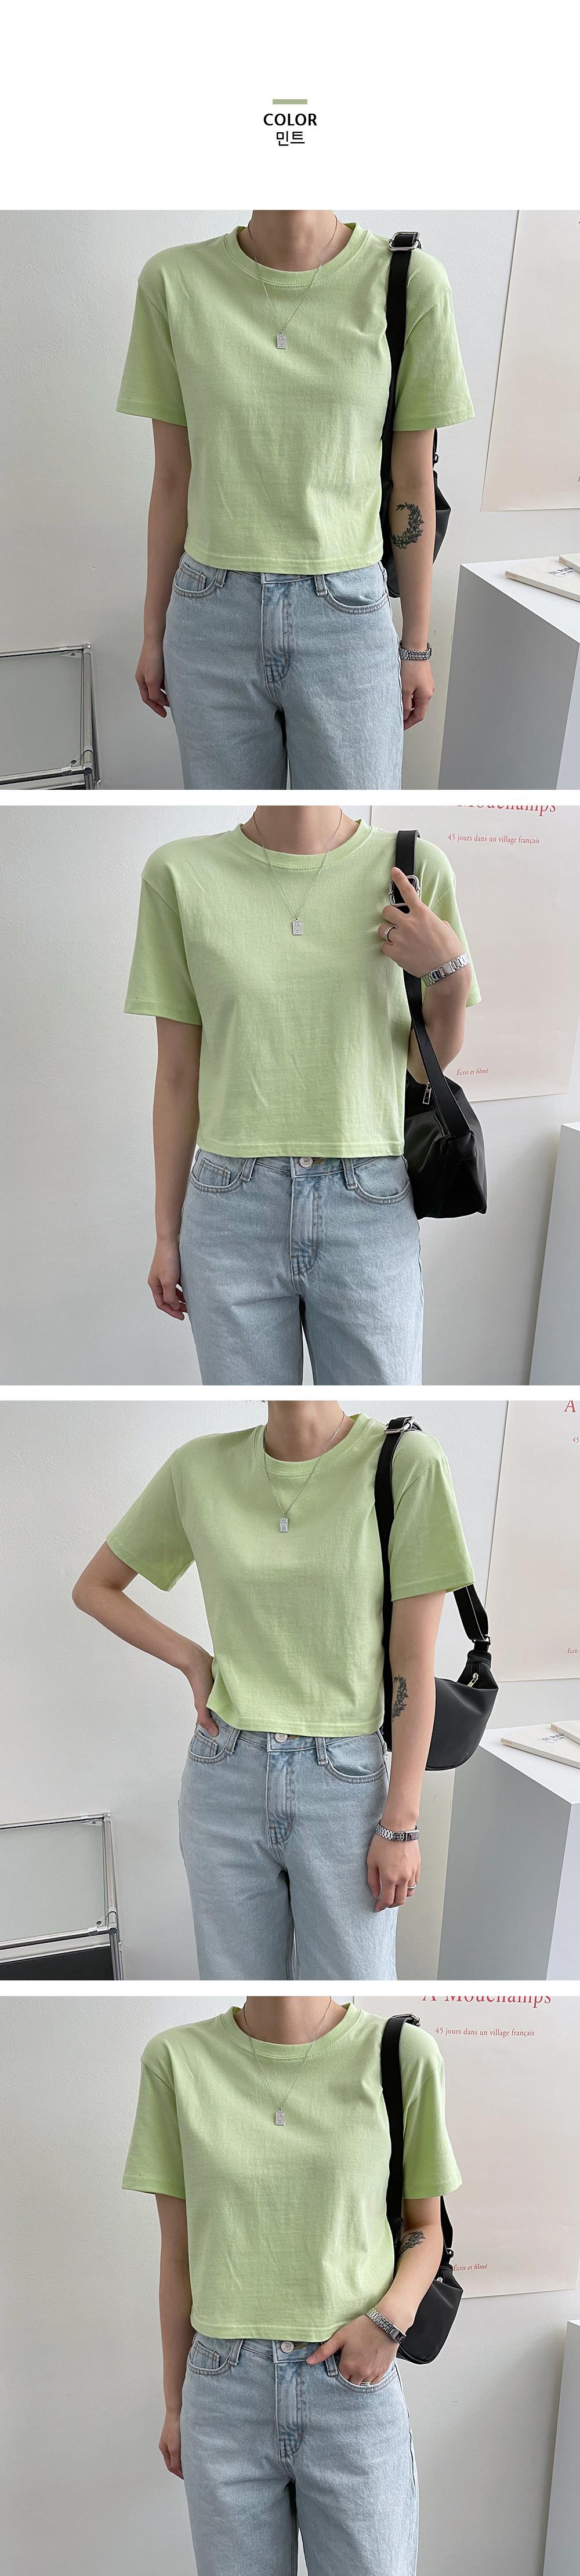 dress model image-S1L20